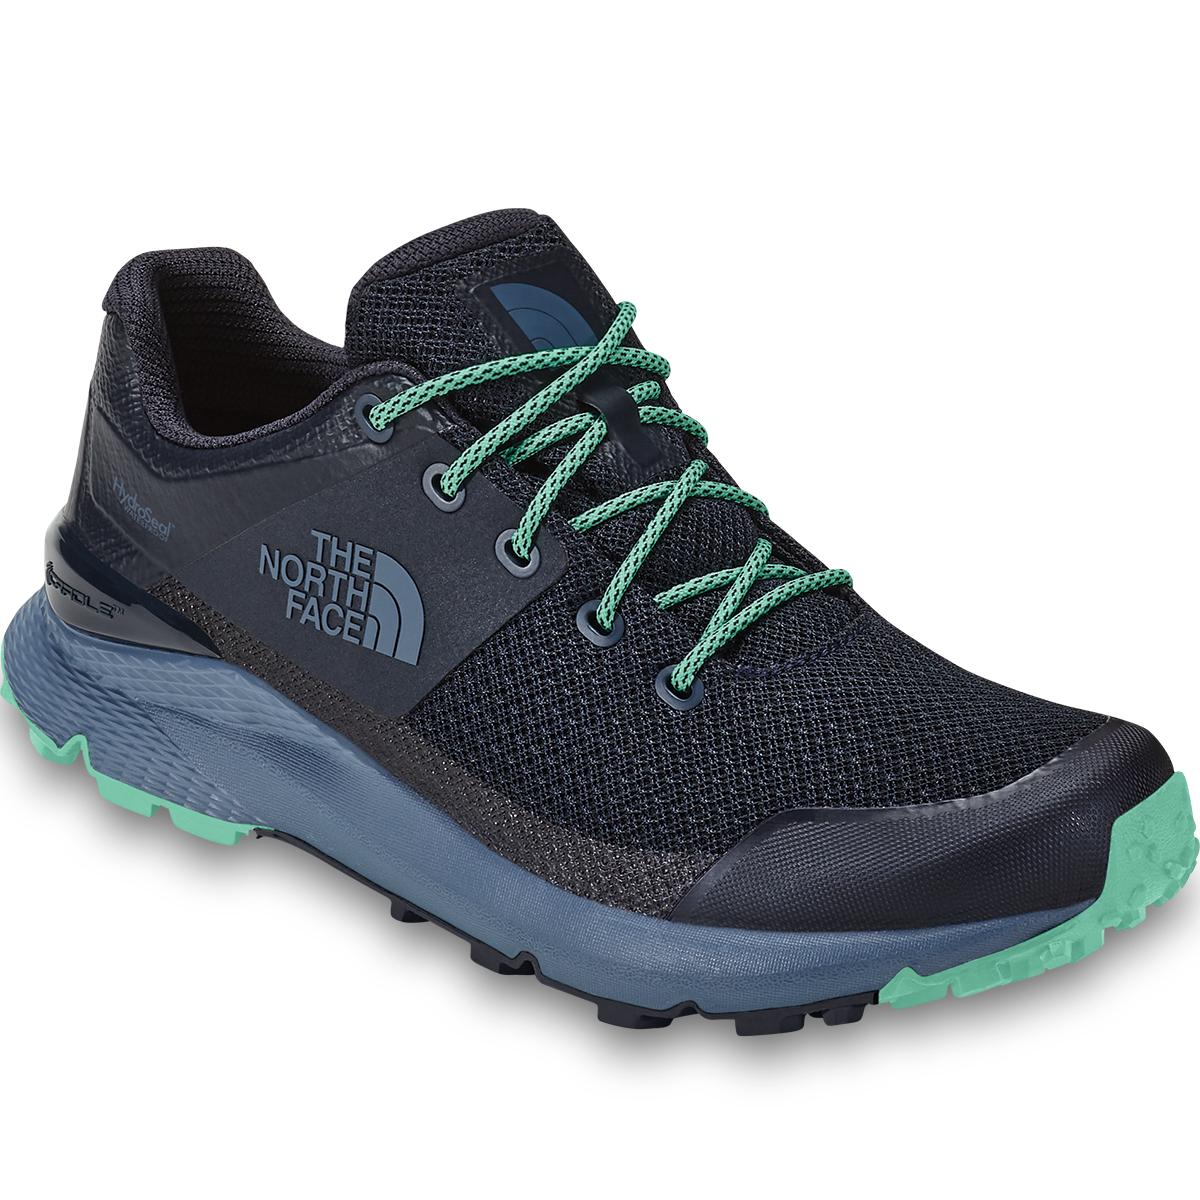 Vals Waterproof Hiking Shoes